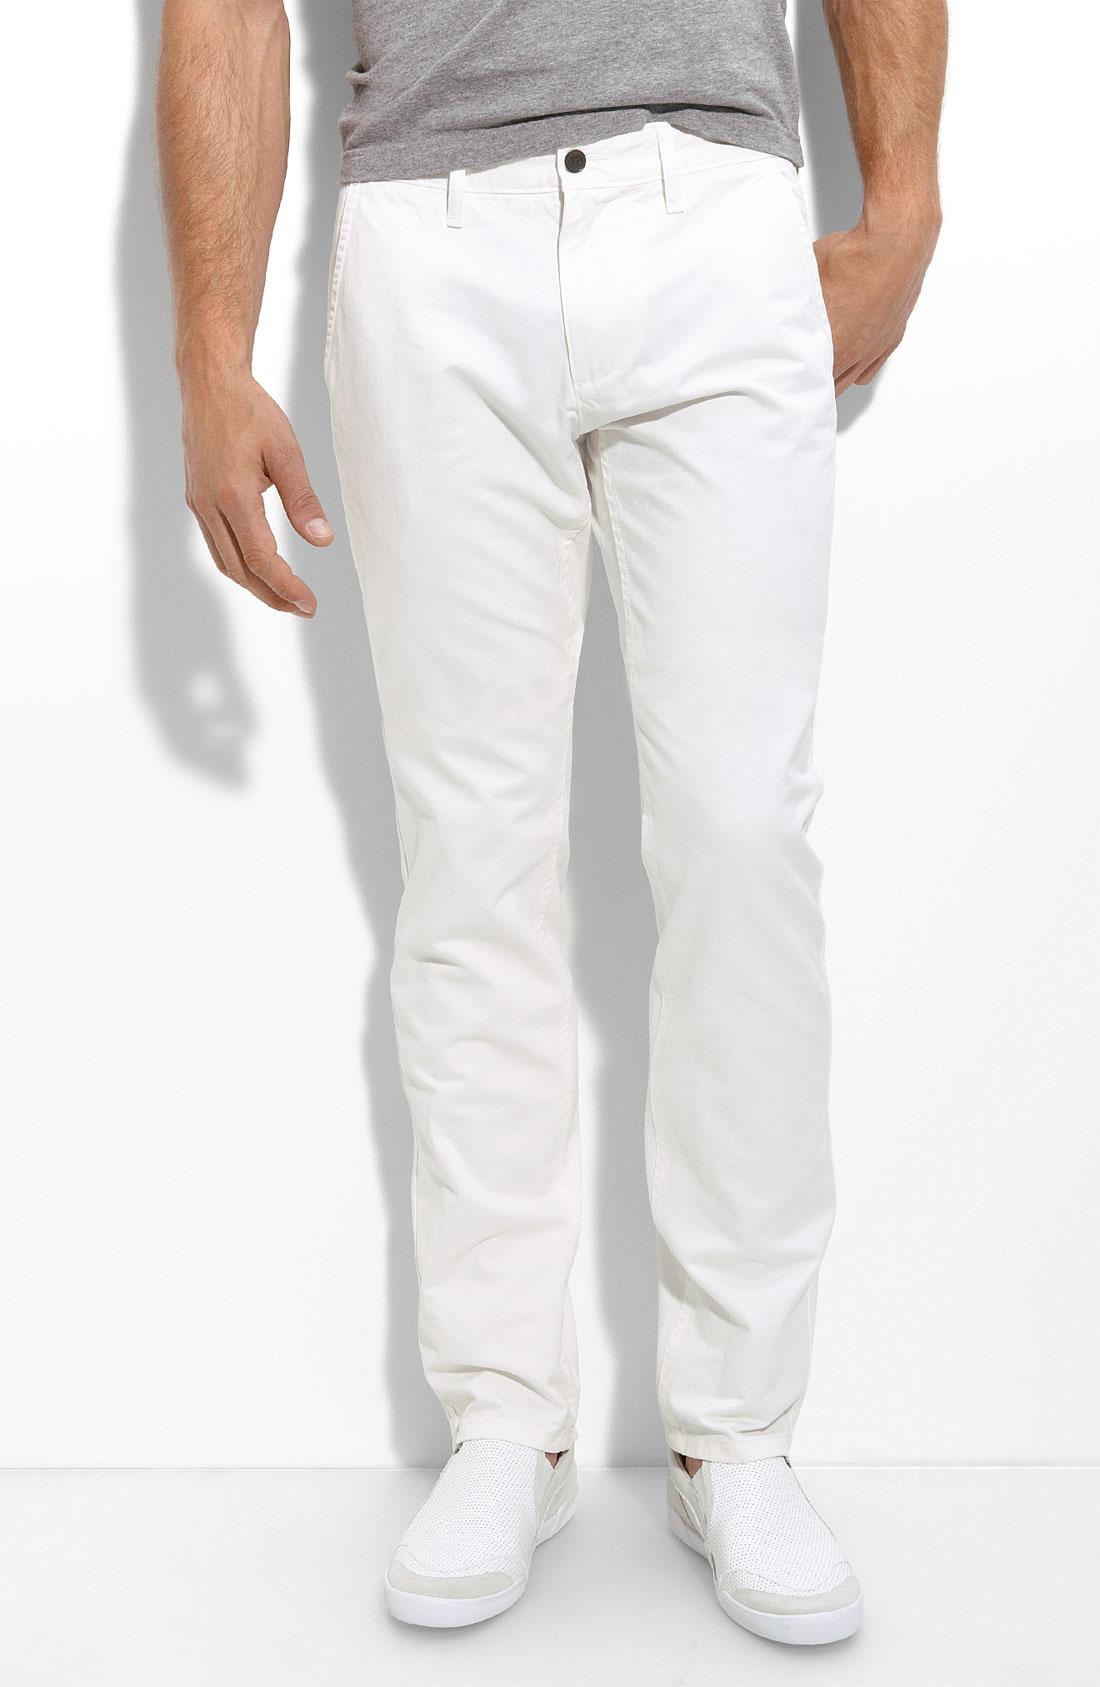 foto Mint Pant Outfits for Men – 30 Ideas How to Wear Mint Pants